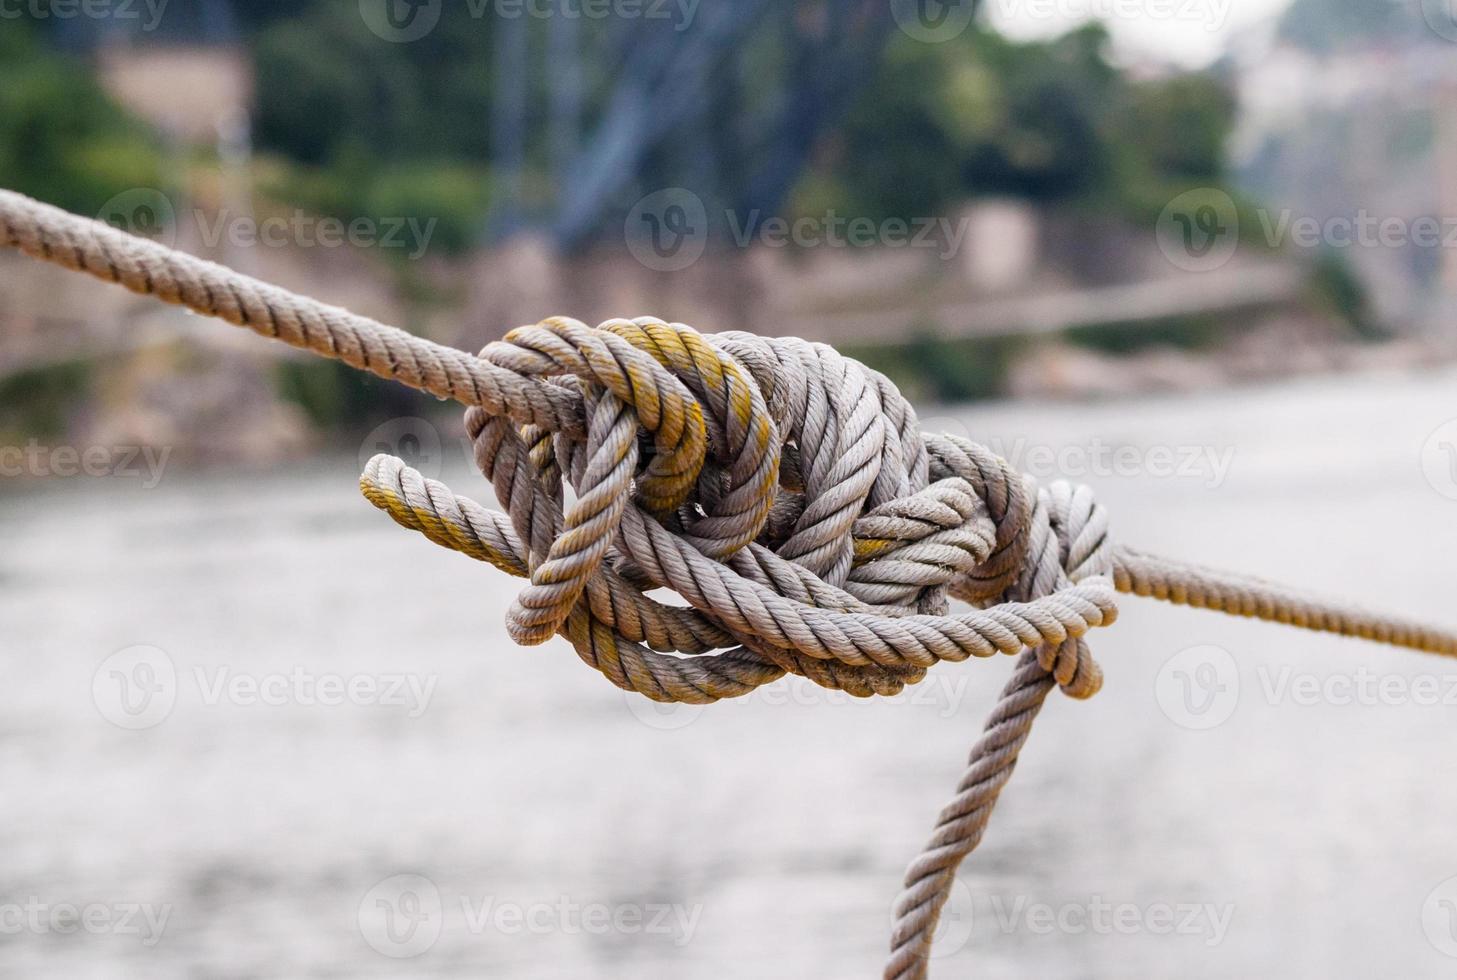 Wirrwarrknoten im festgezogenen Seil foto